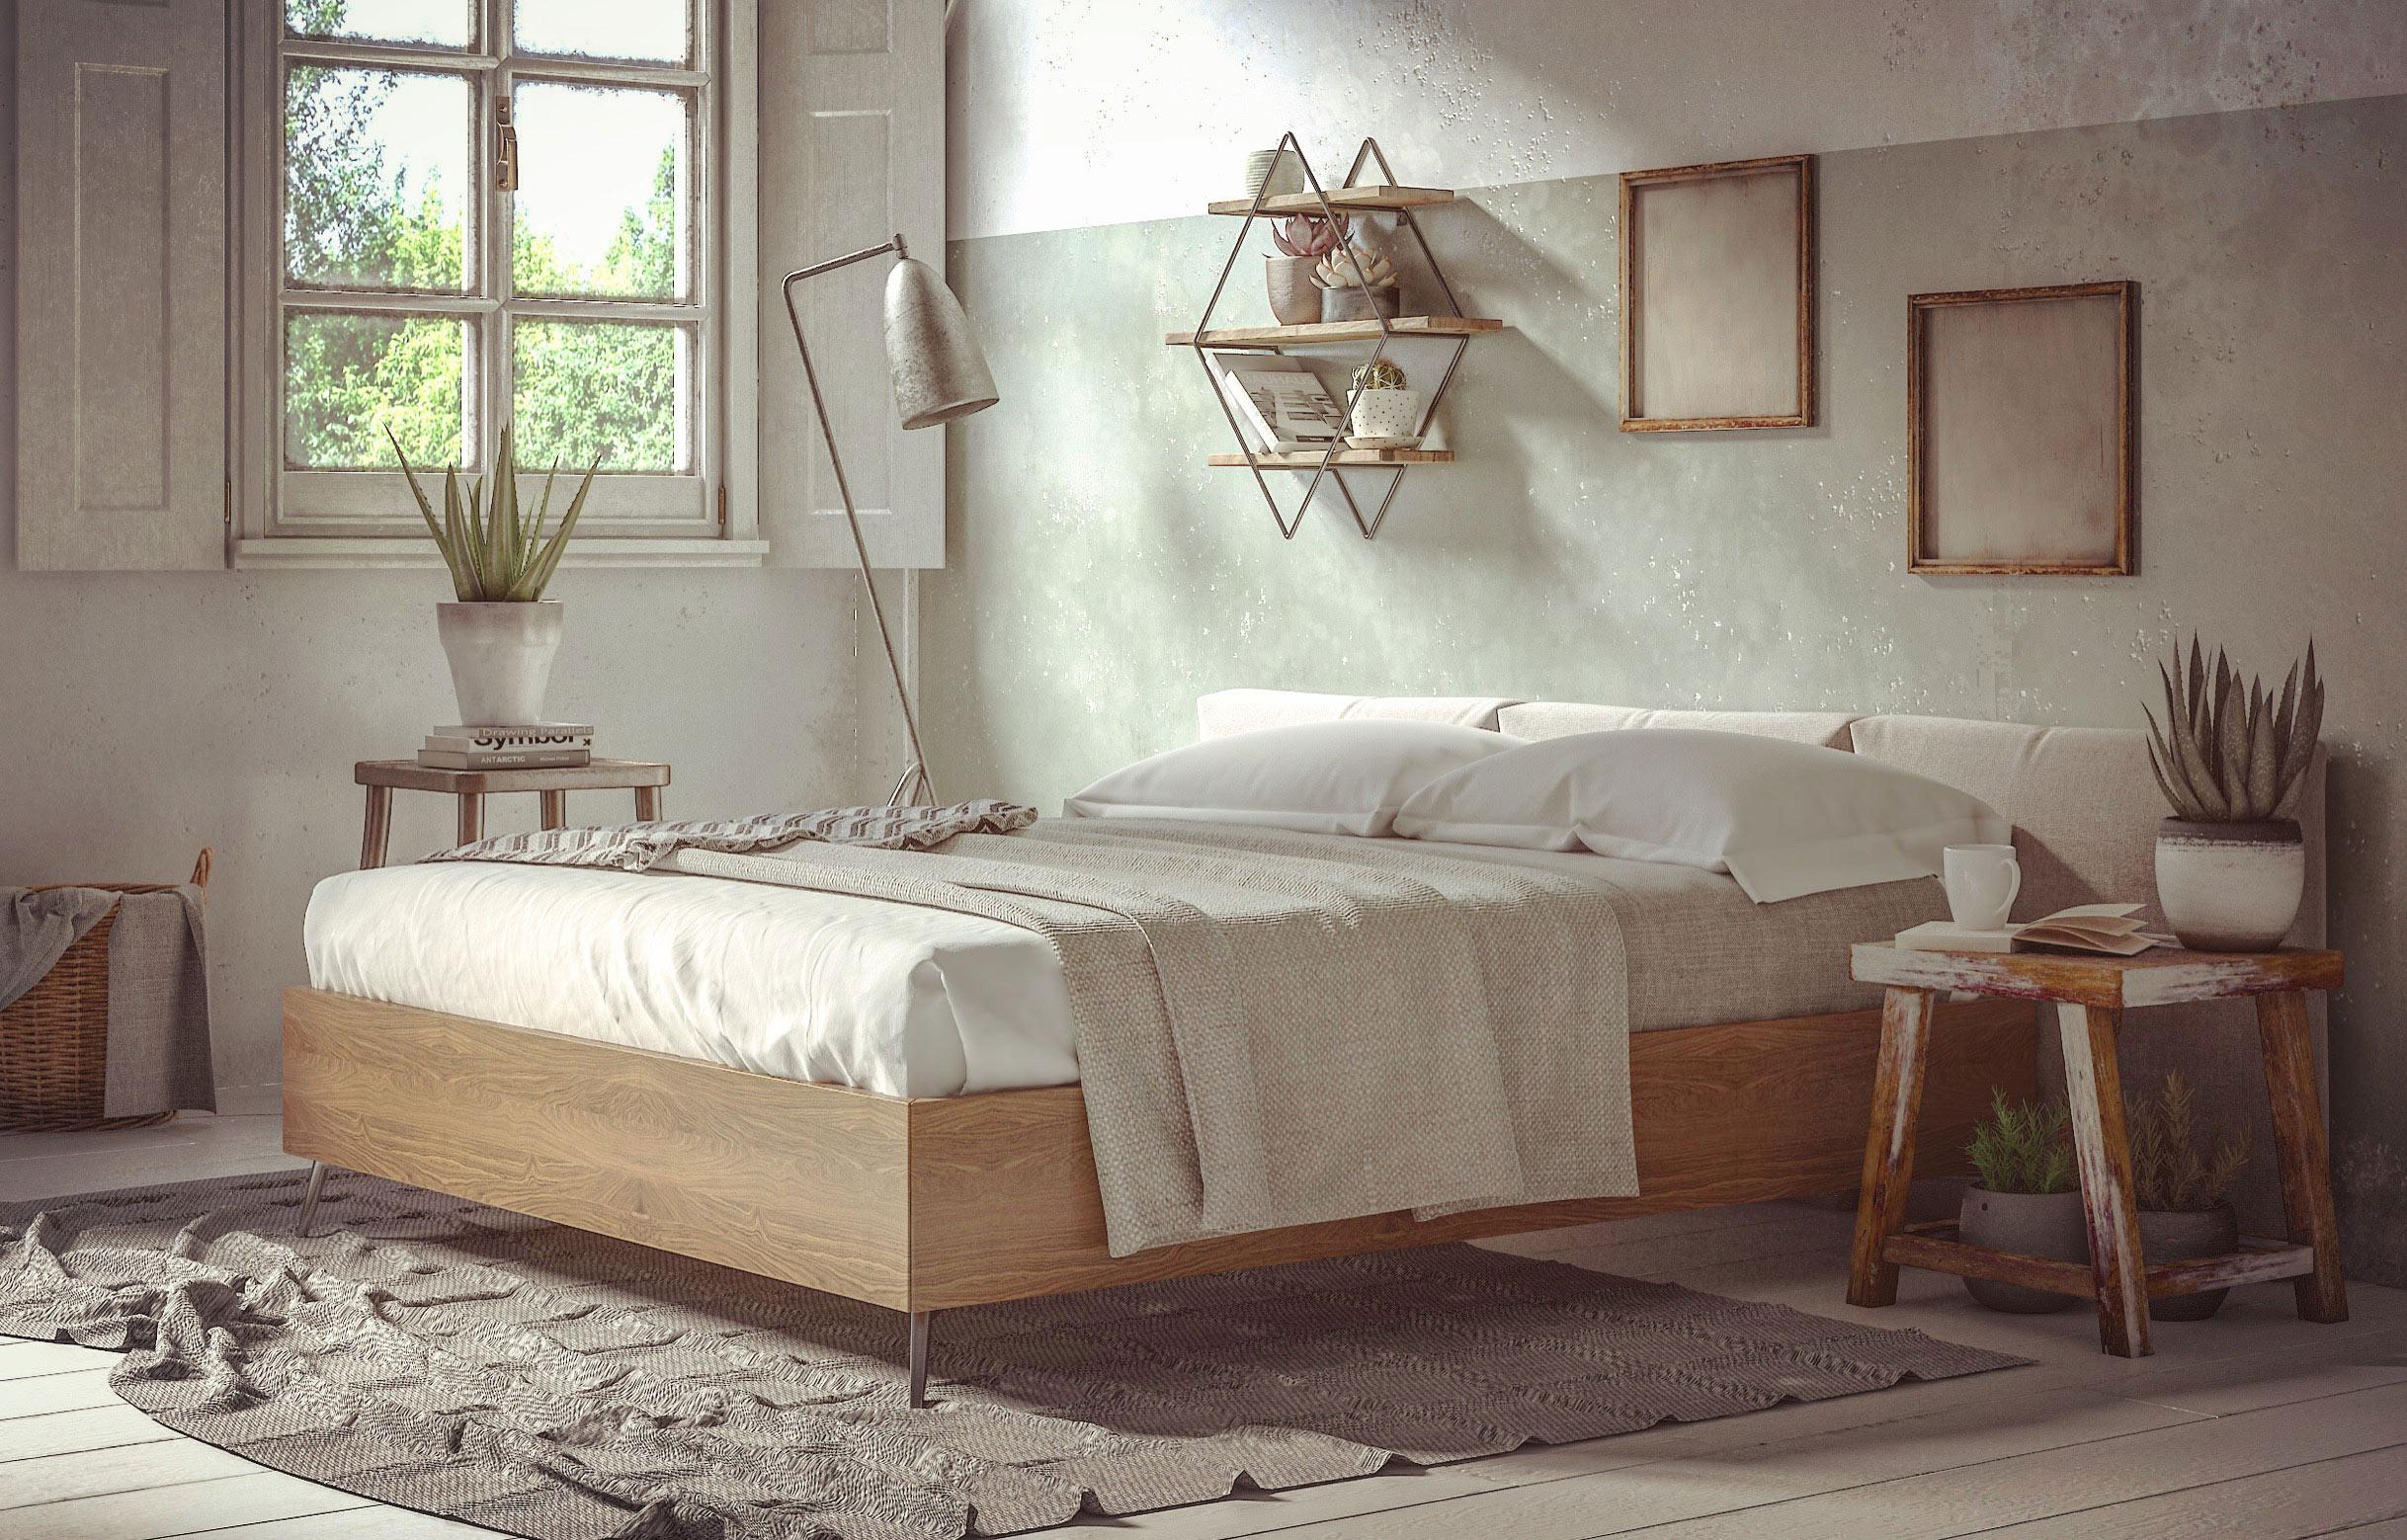 Boconcept Bedroom scene Vray Next - [FINAL] Architettura e